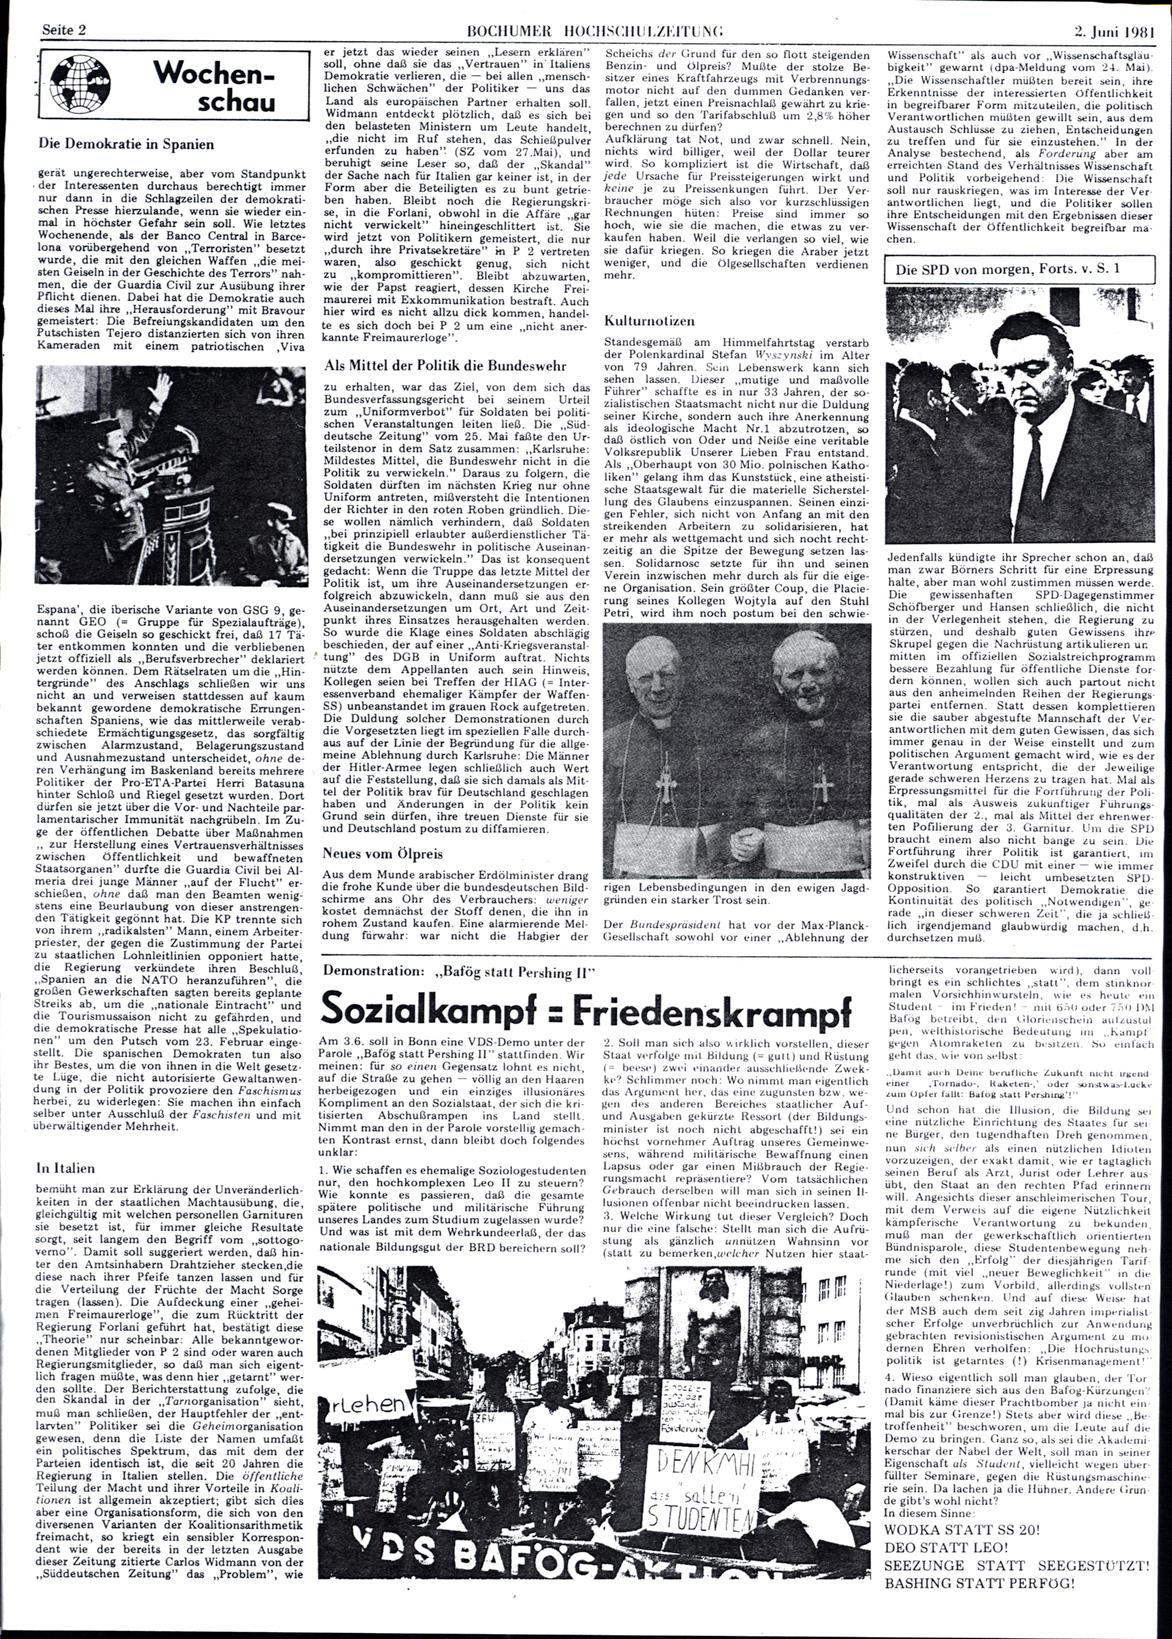 Bochum_BHZ_19810602_033_002